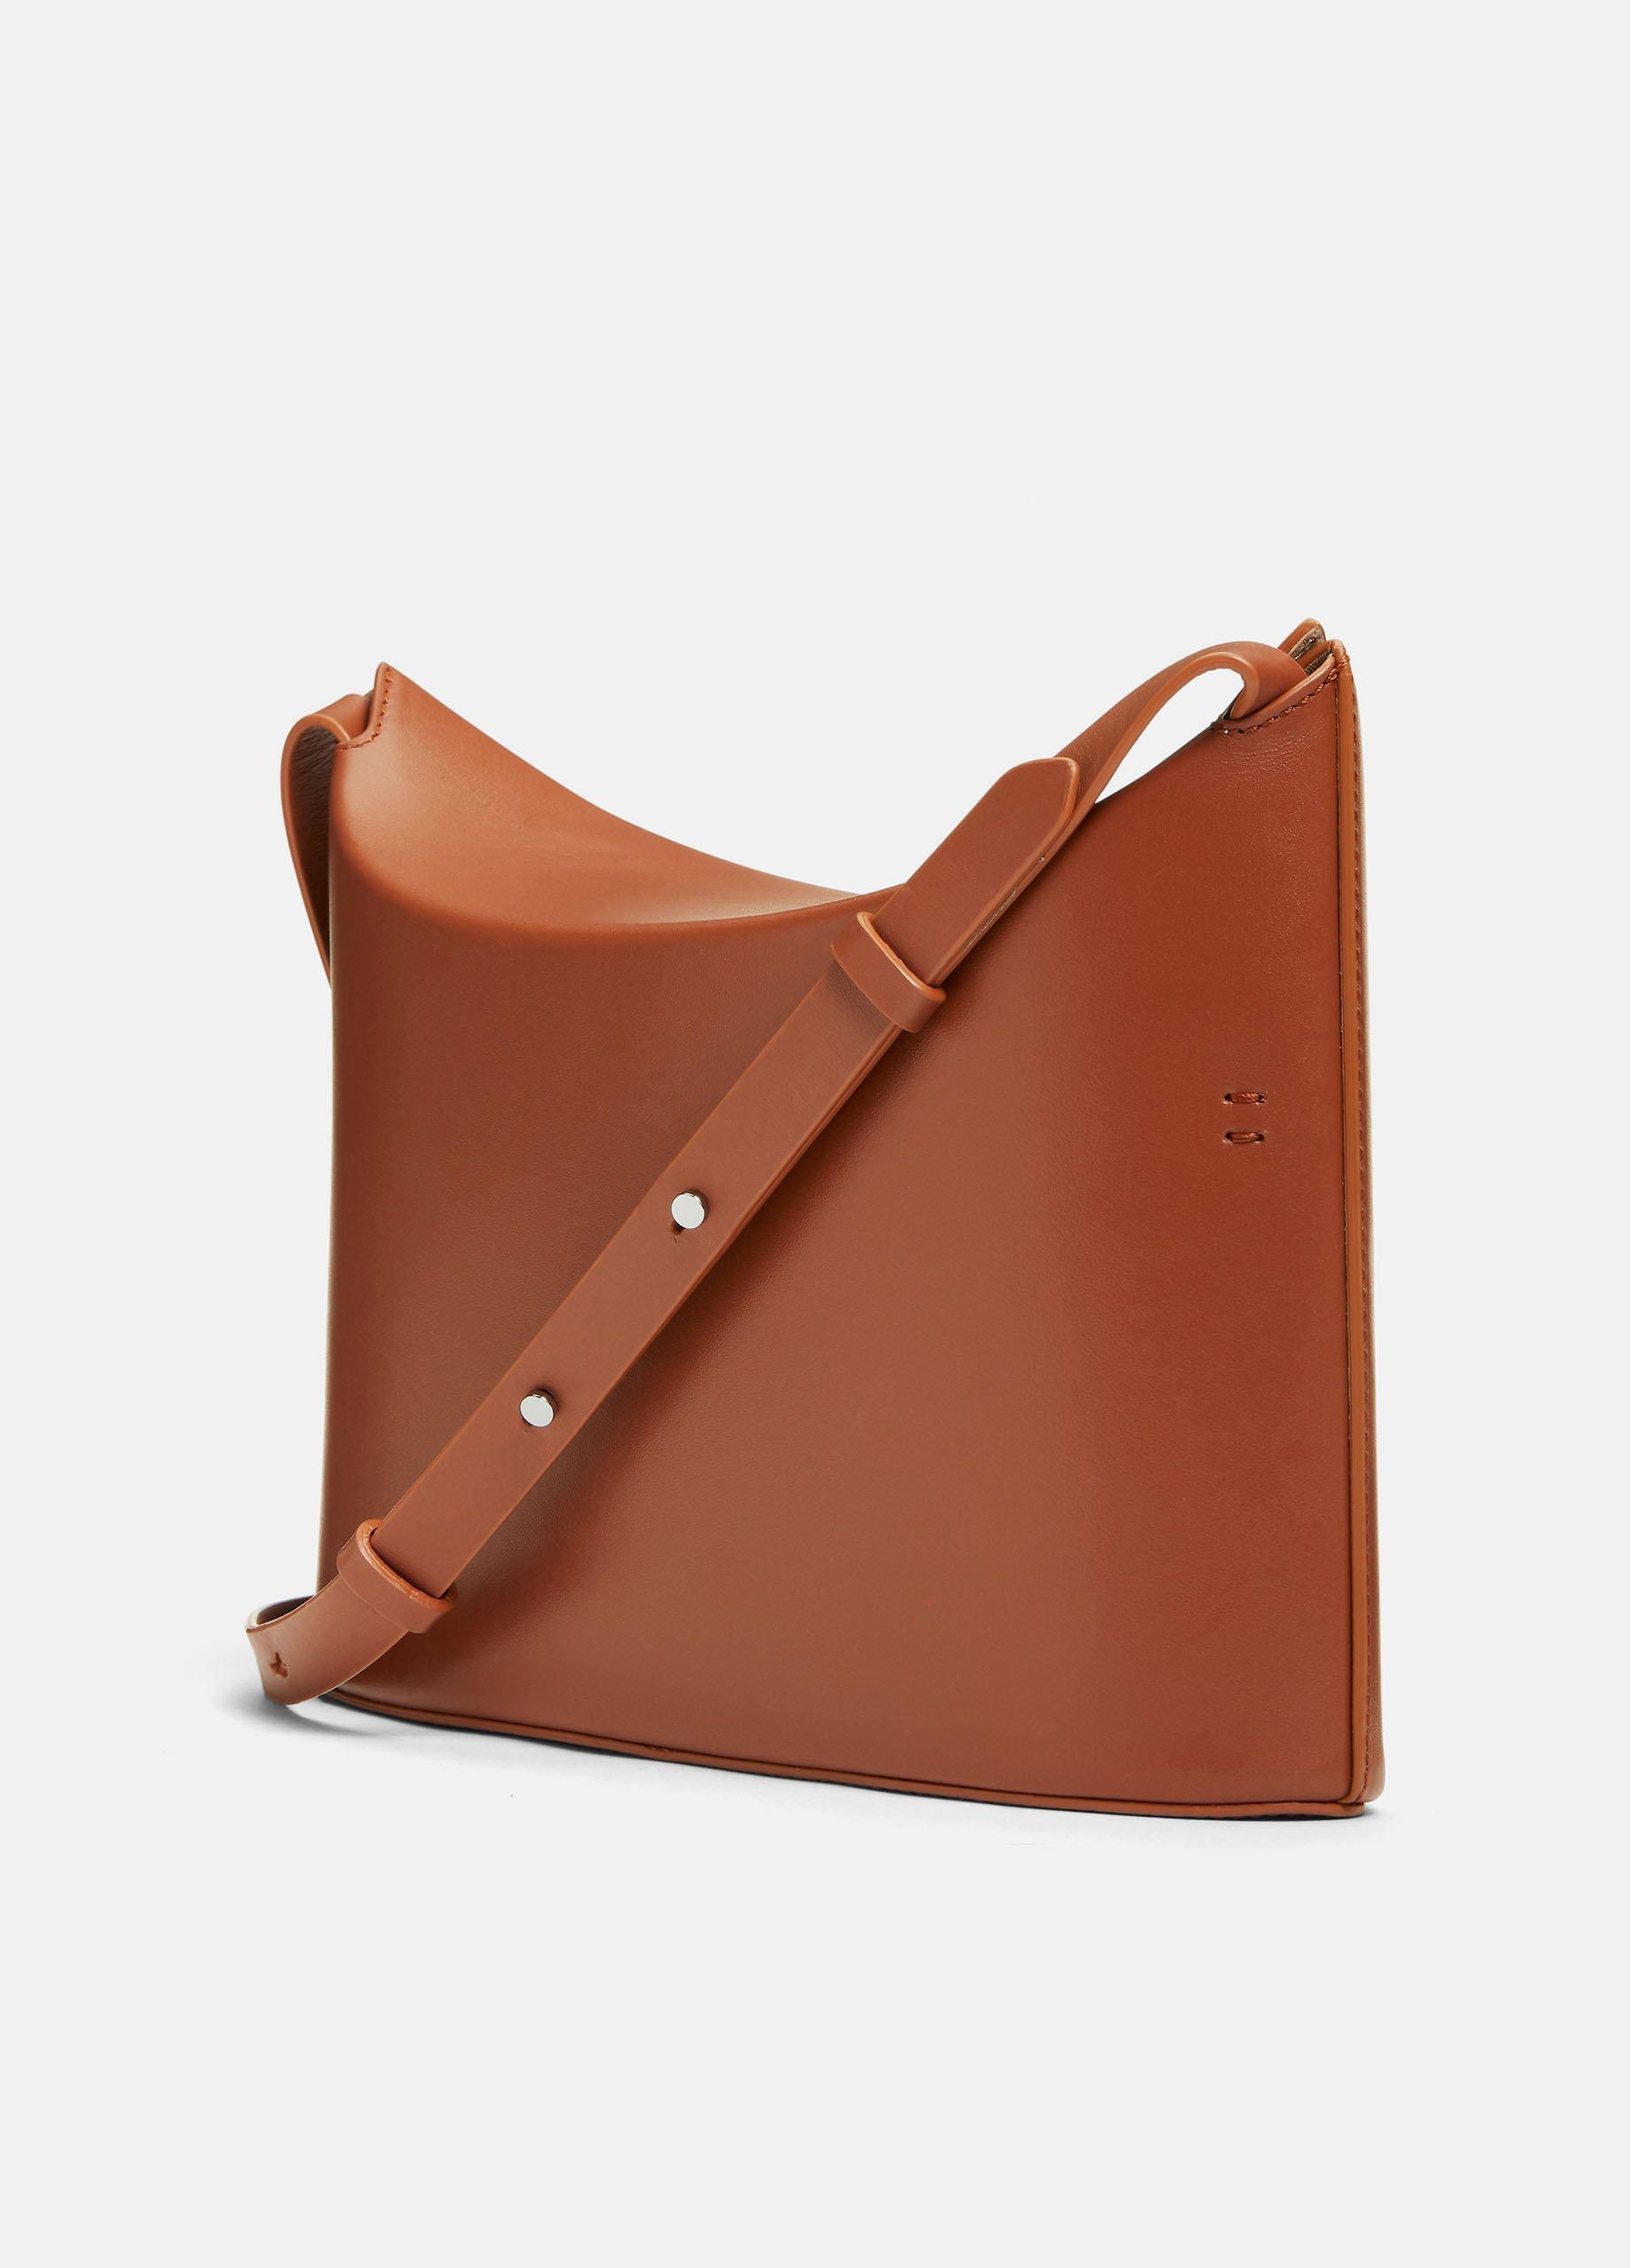 Aesther Ekme/ Sway Bag